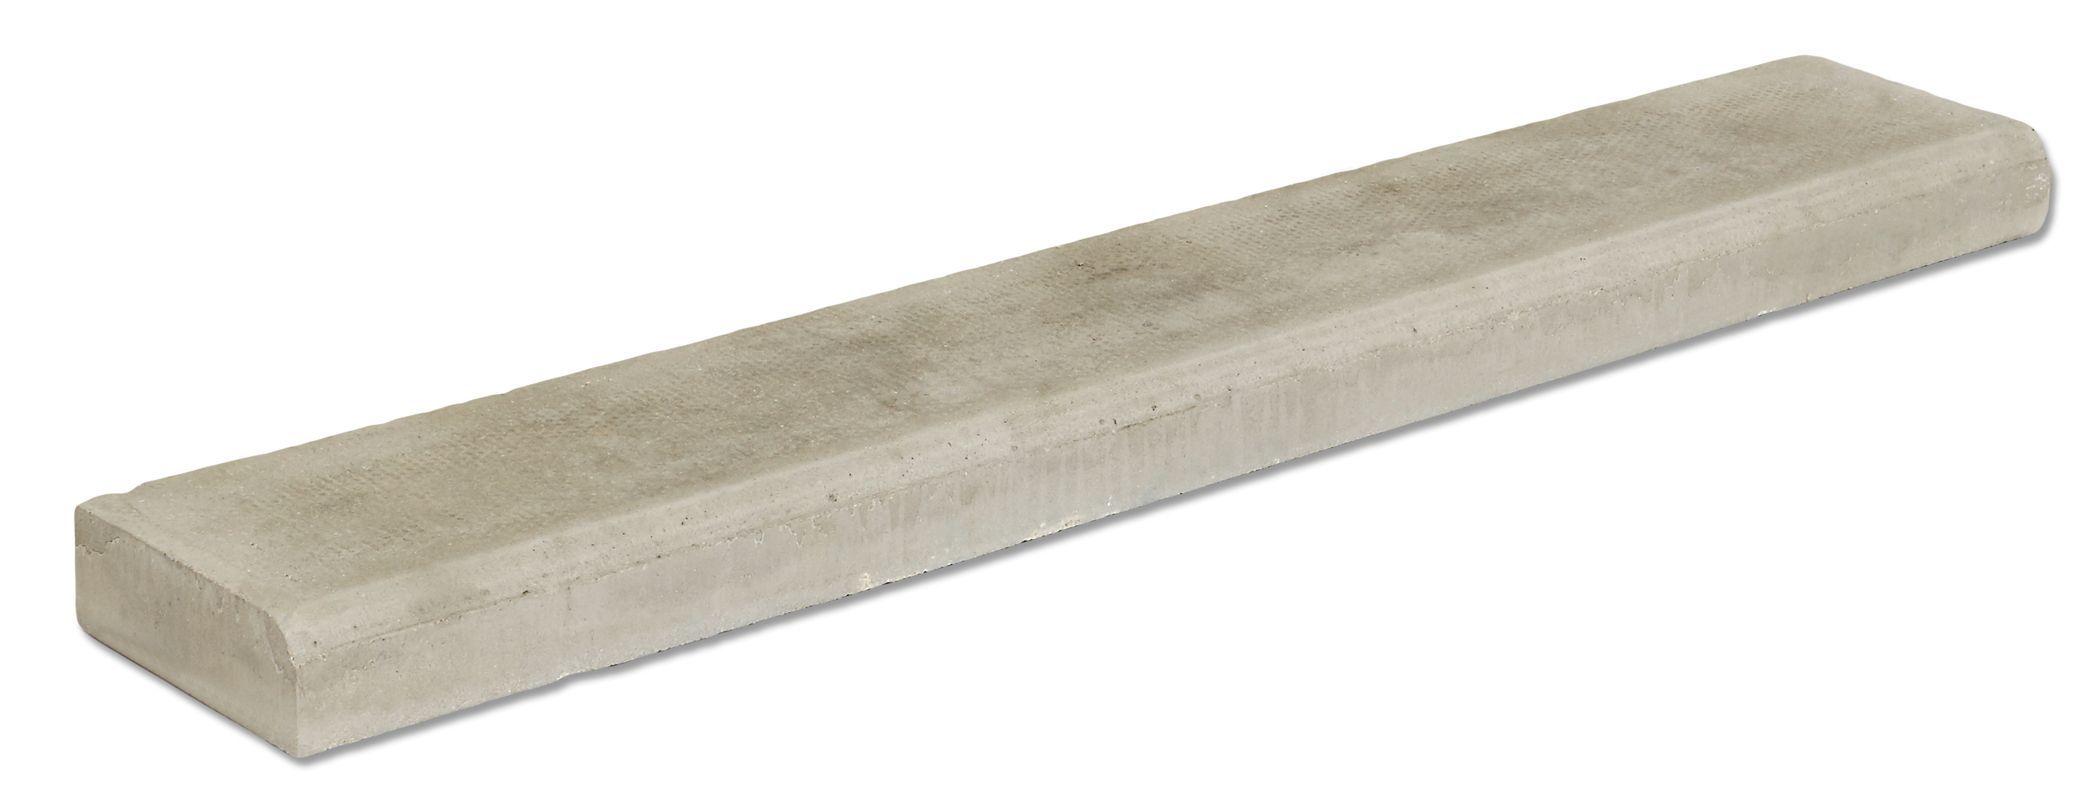 Charcon Bullnose Paving Edging Block Grey L 914mm H 150mm T 50mm Departments Diy At B Q